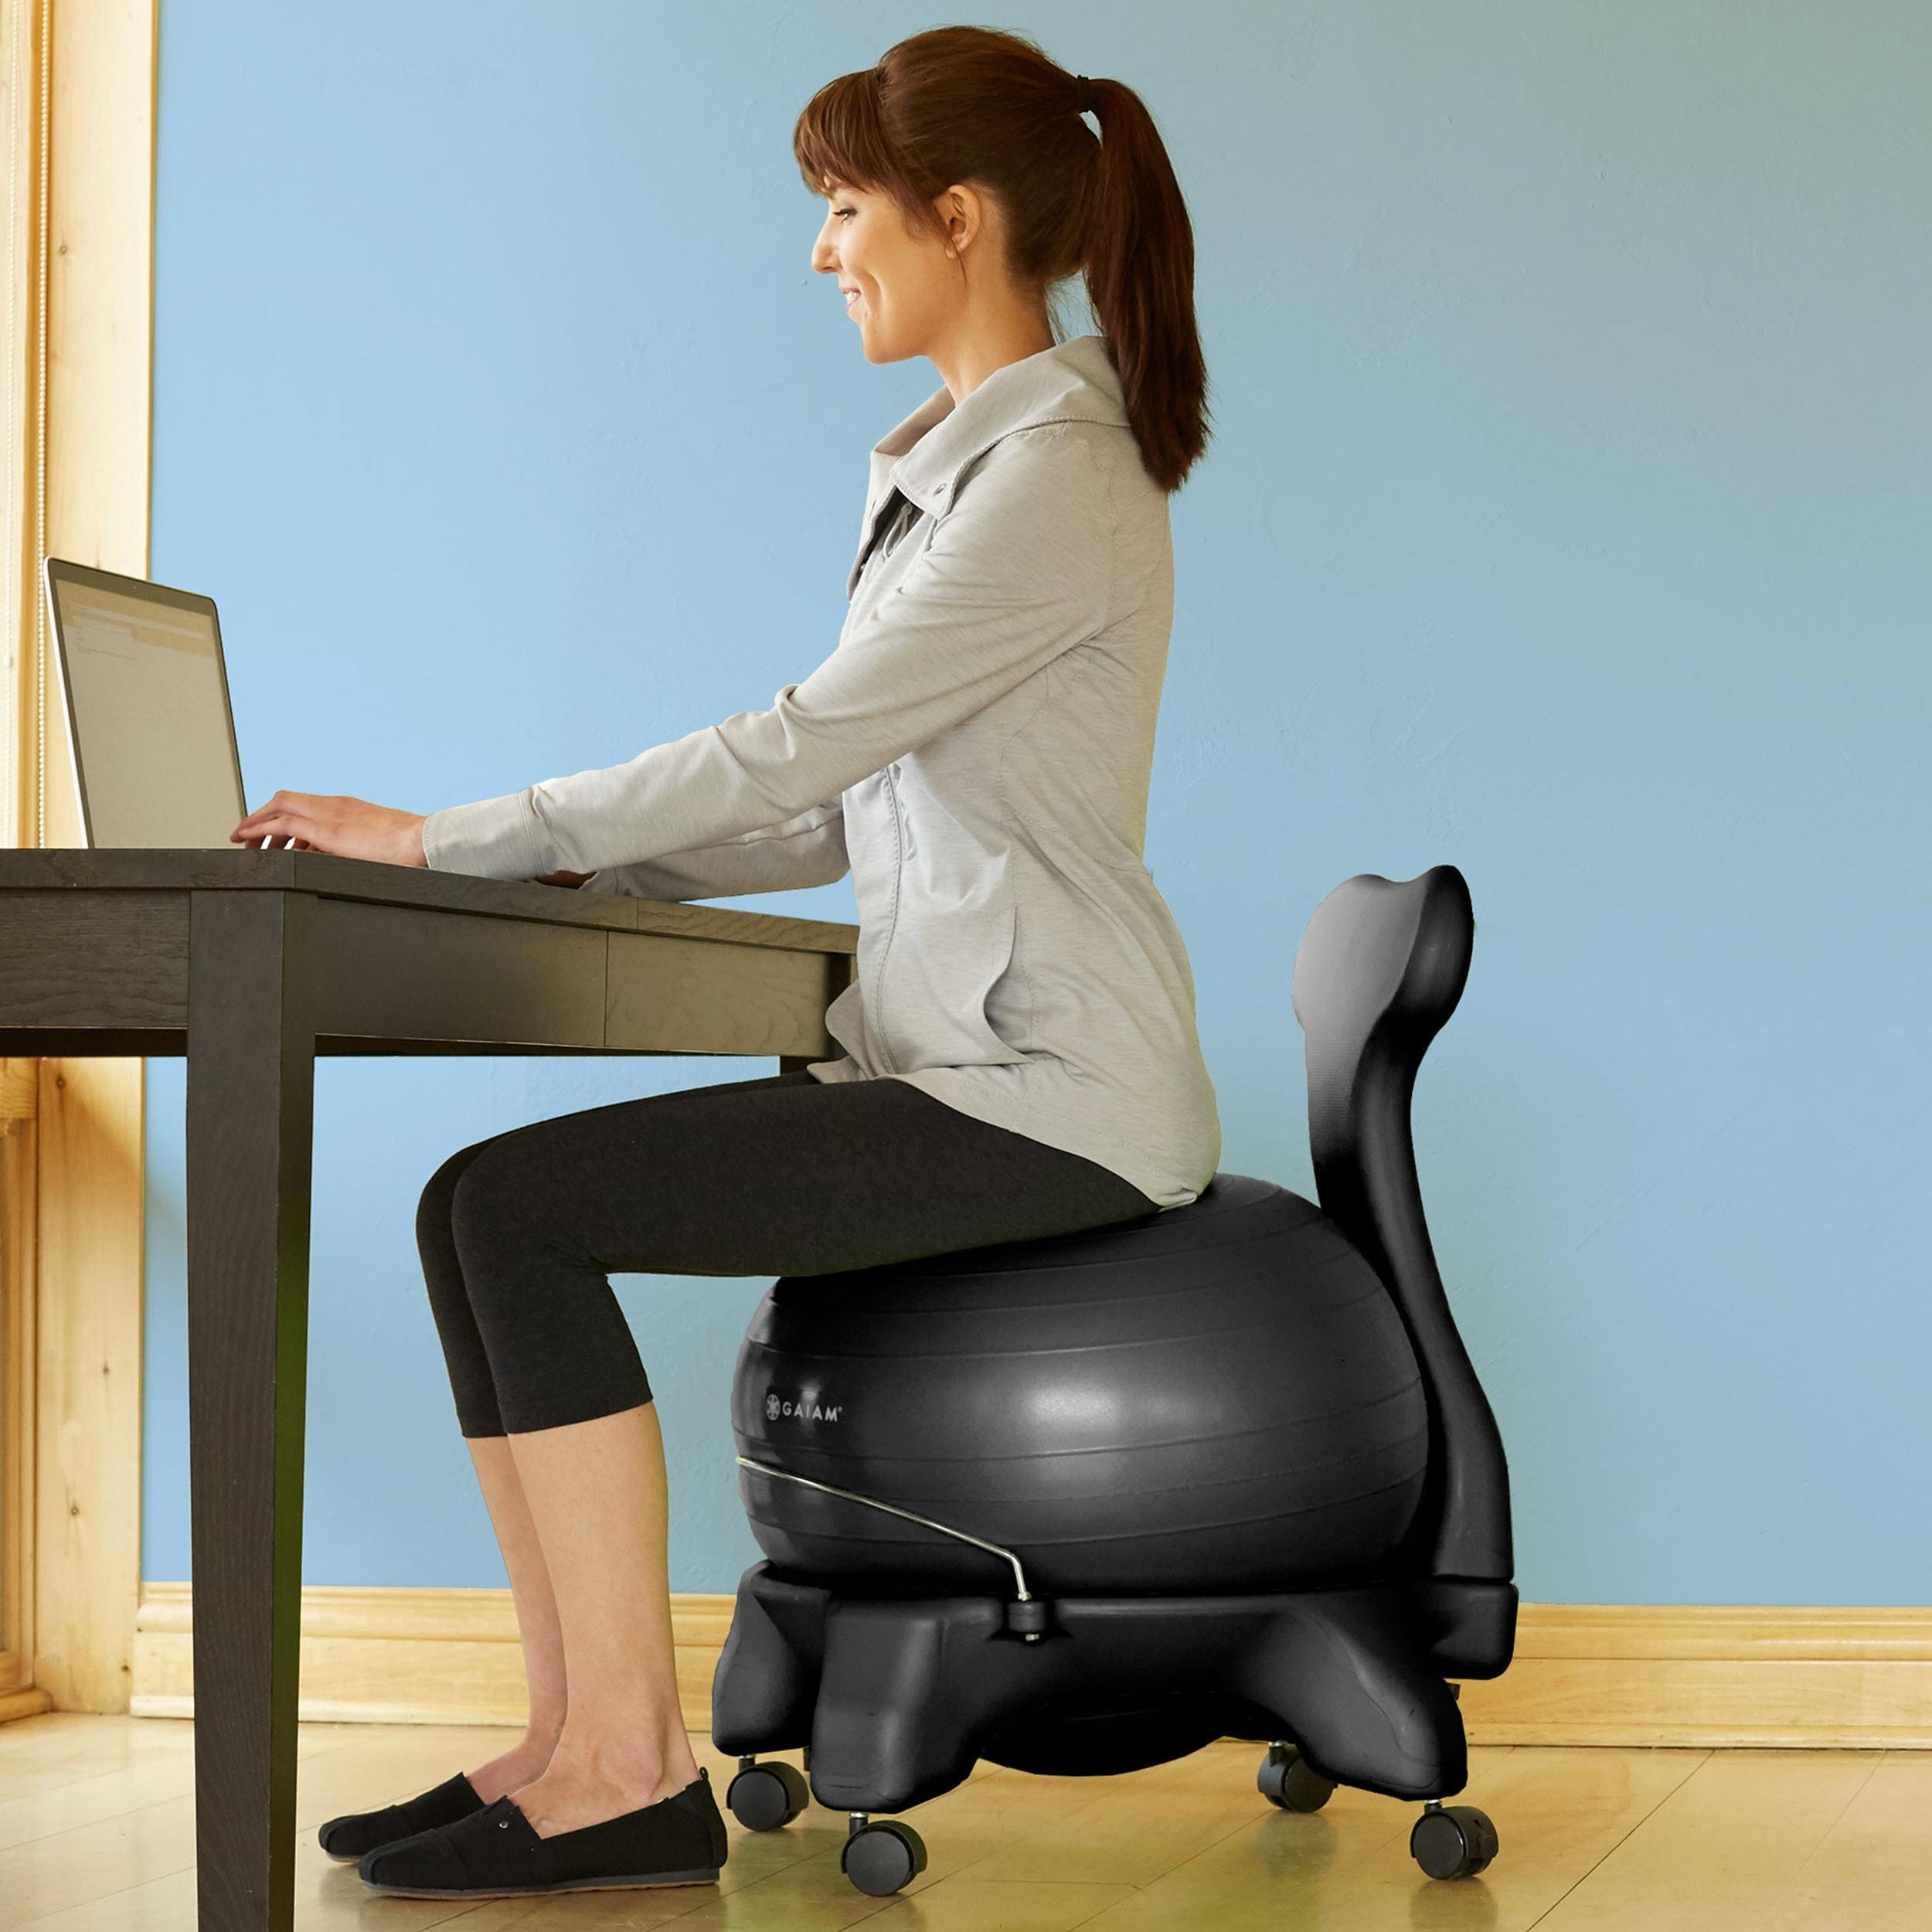 Stability Ball Desk Chair: Amazon.com : Gaiam Balance Ball Chair (Black) : Exercise